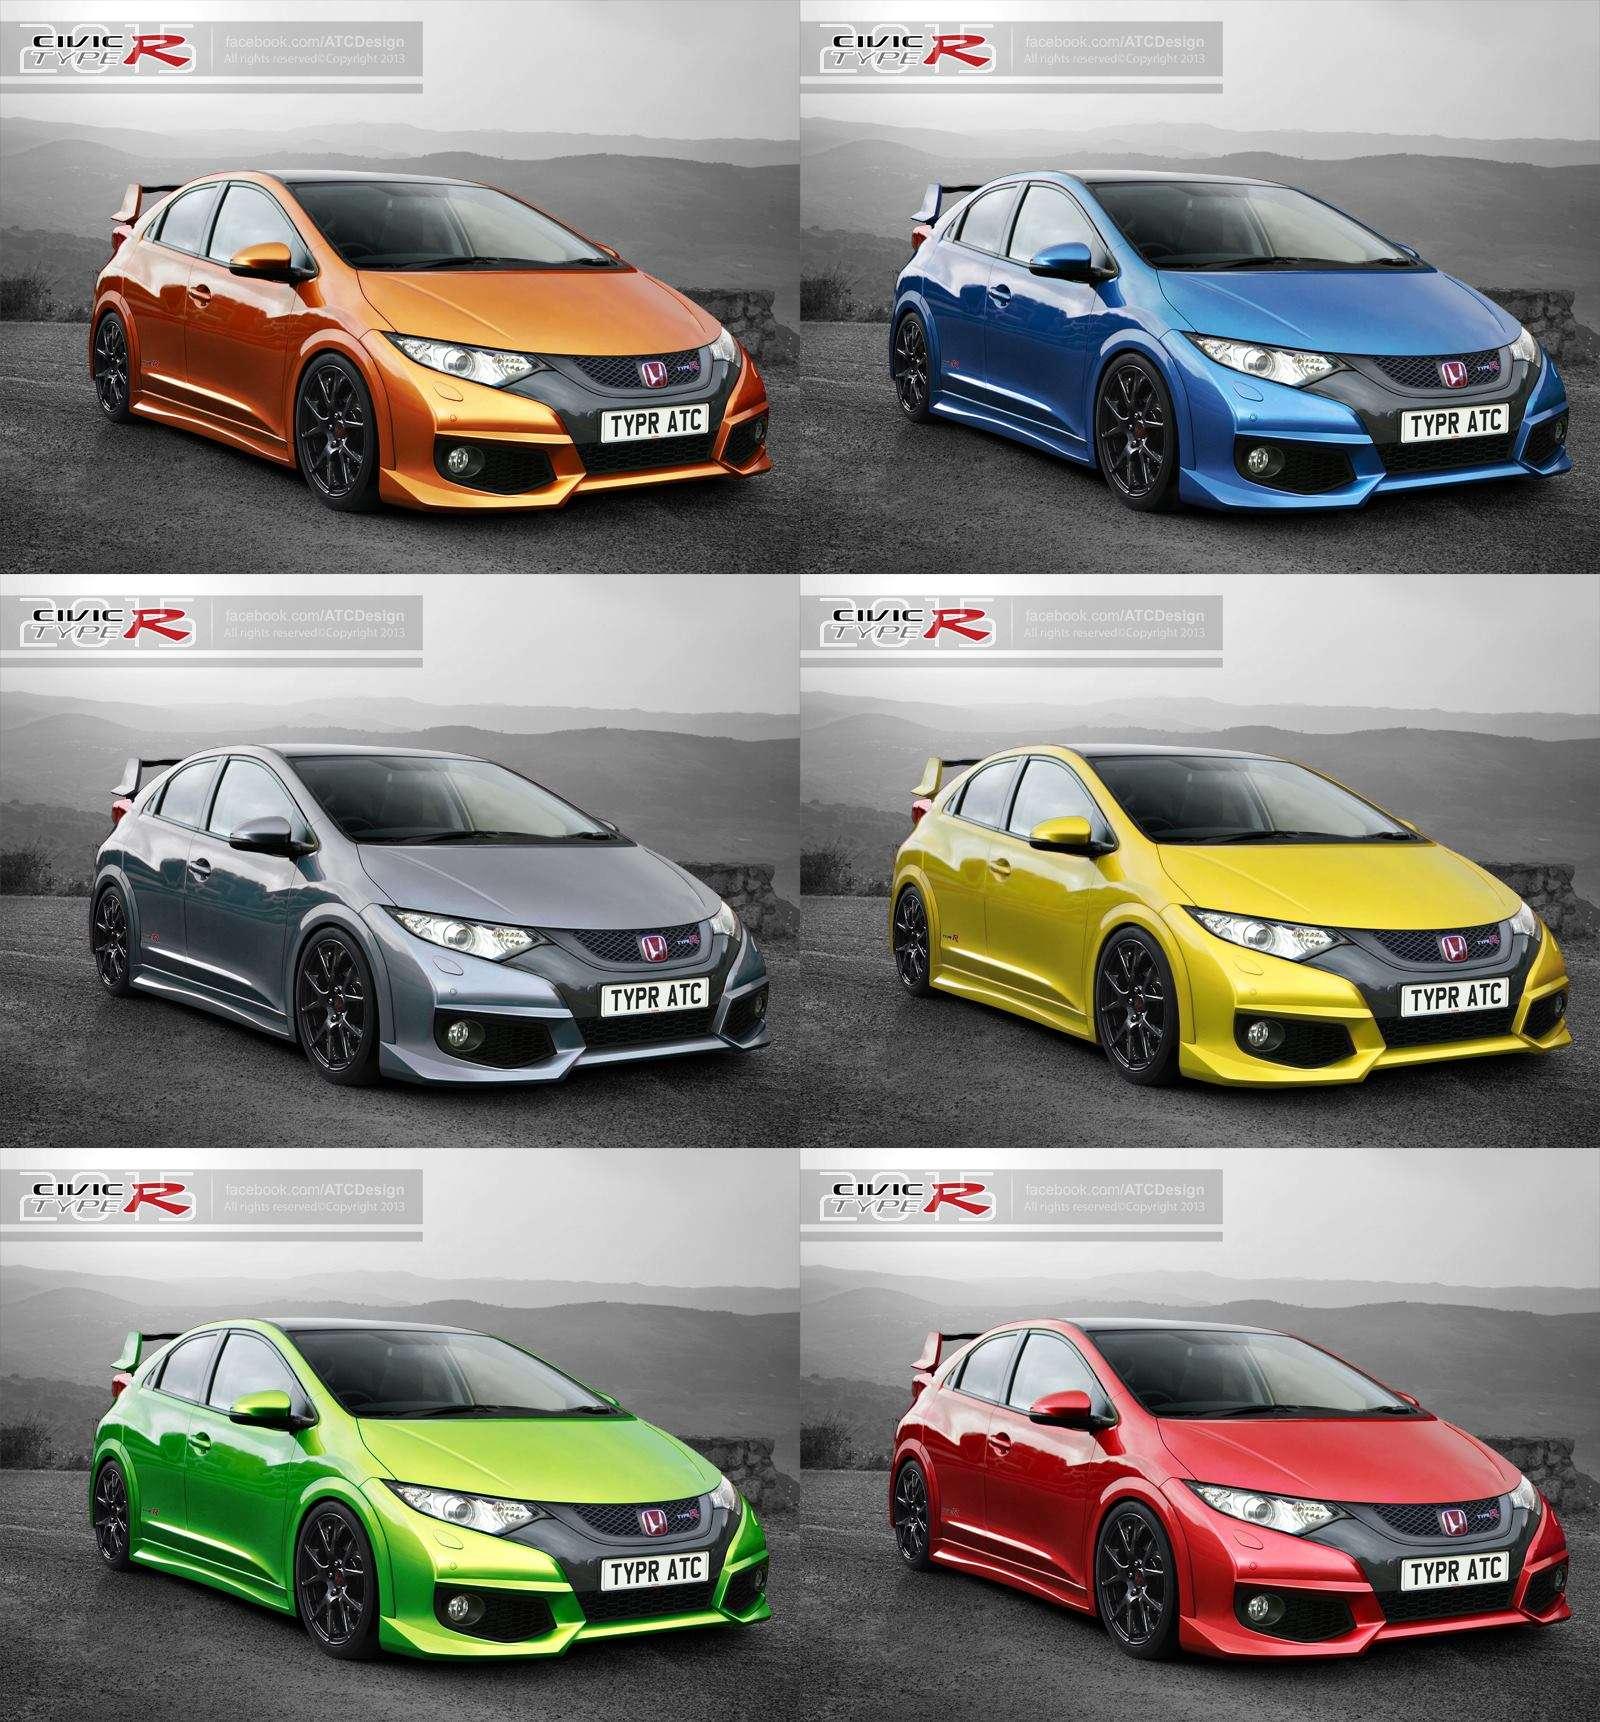 Honda Civic Type-R 2015 renderings